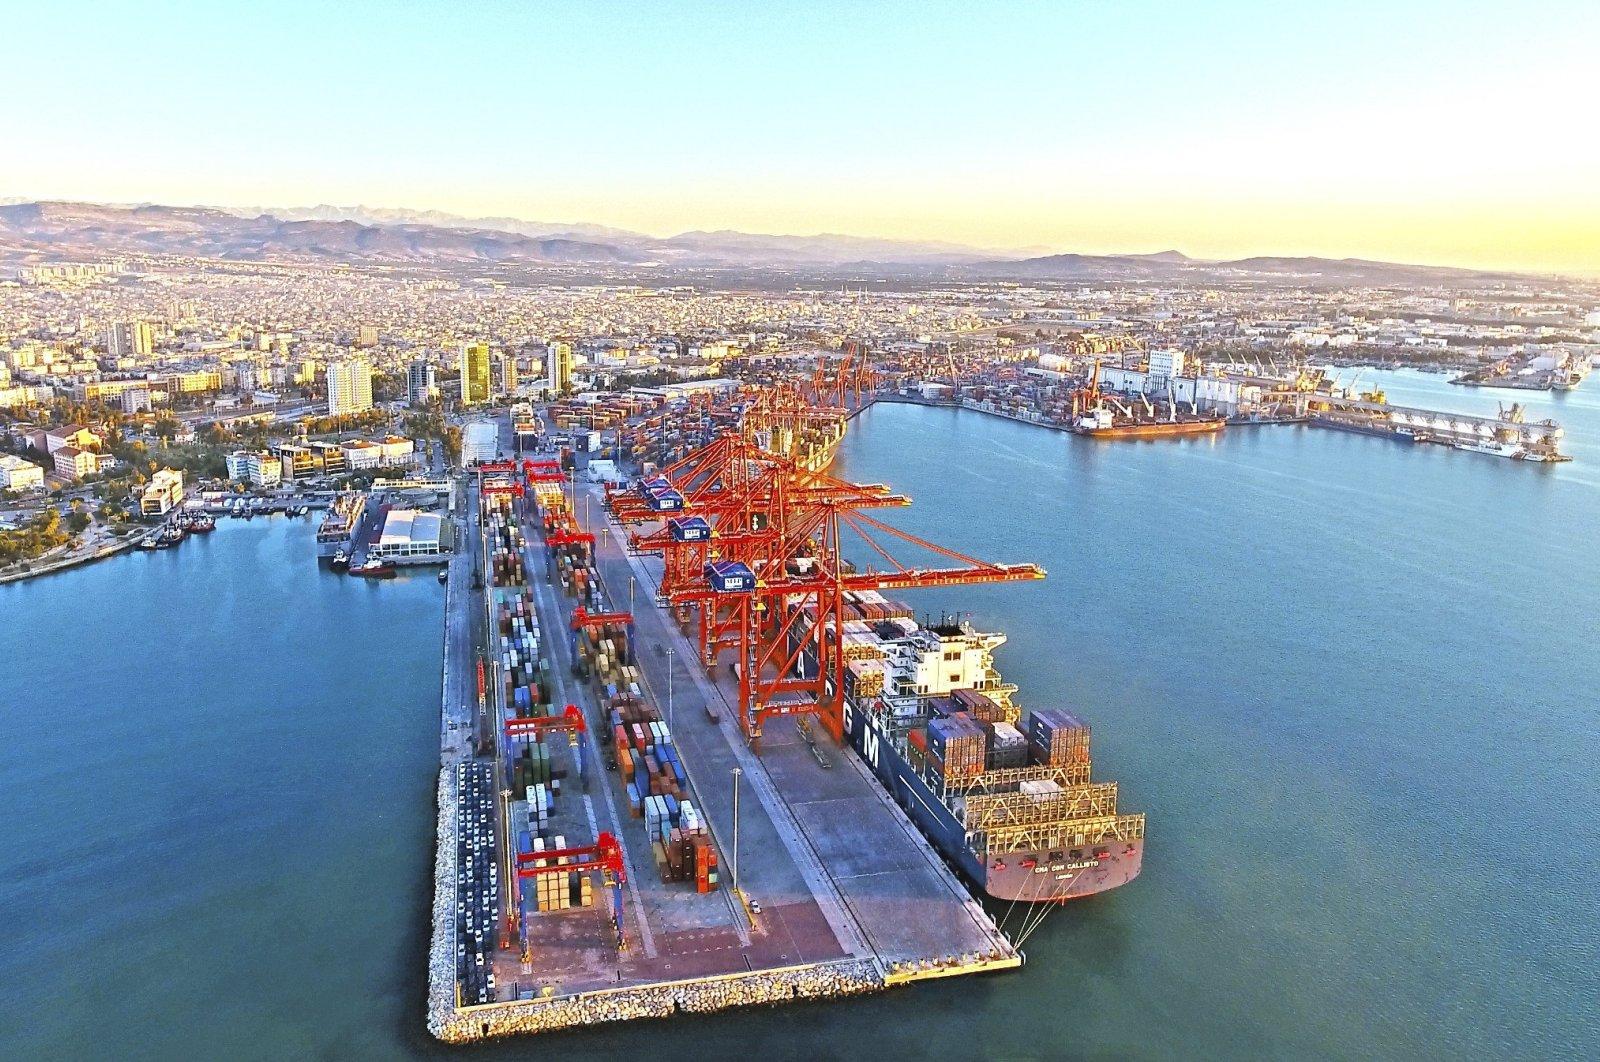 The Mersin International Port on Turkey's Mediterranean coast, July 20, 2019. (IHA Photo)